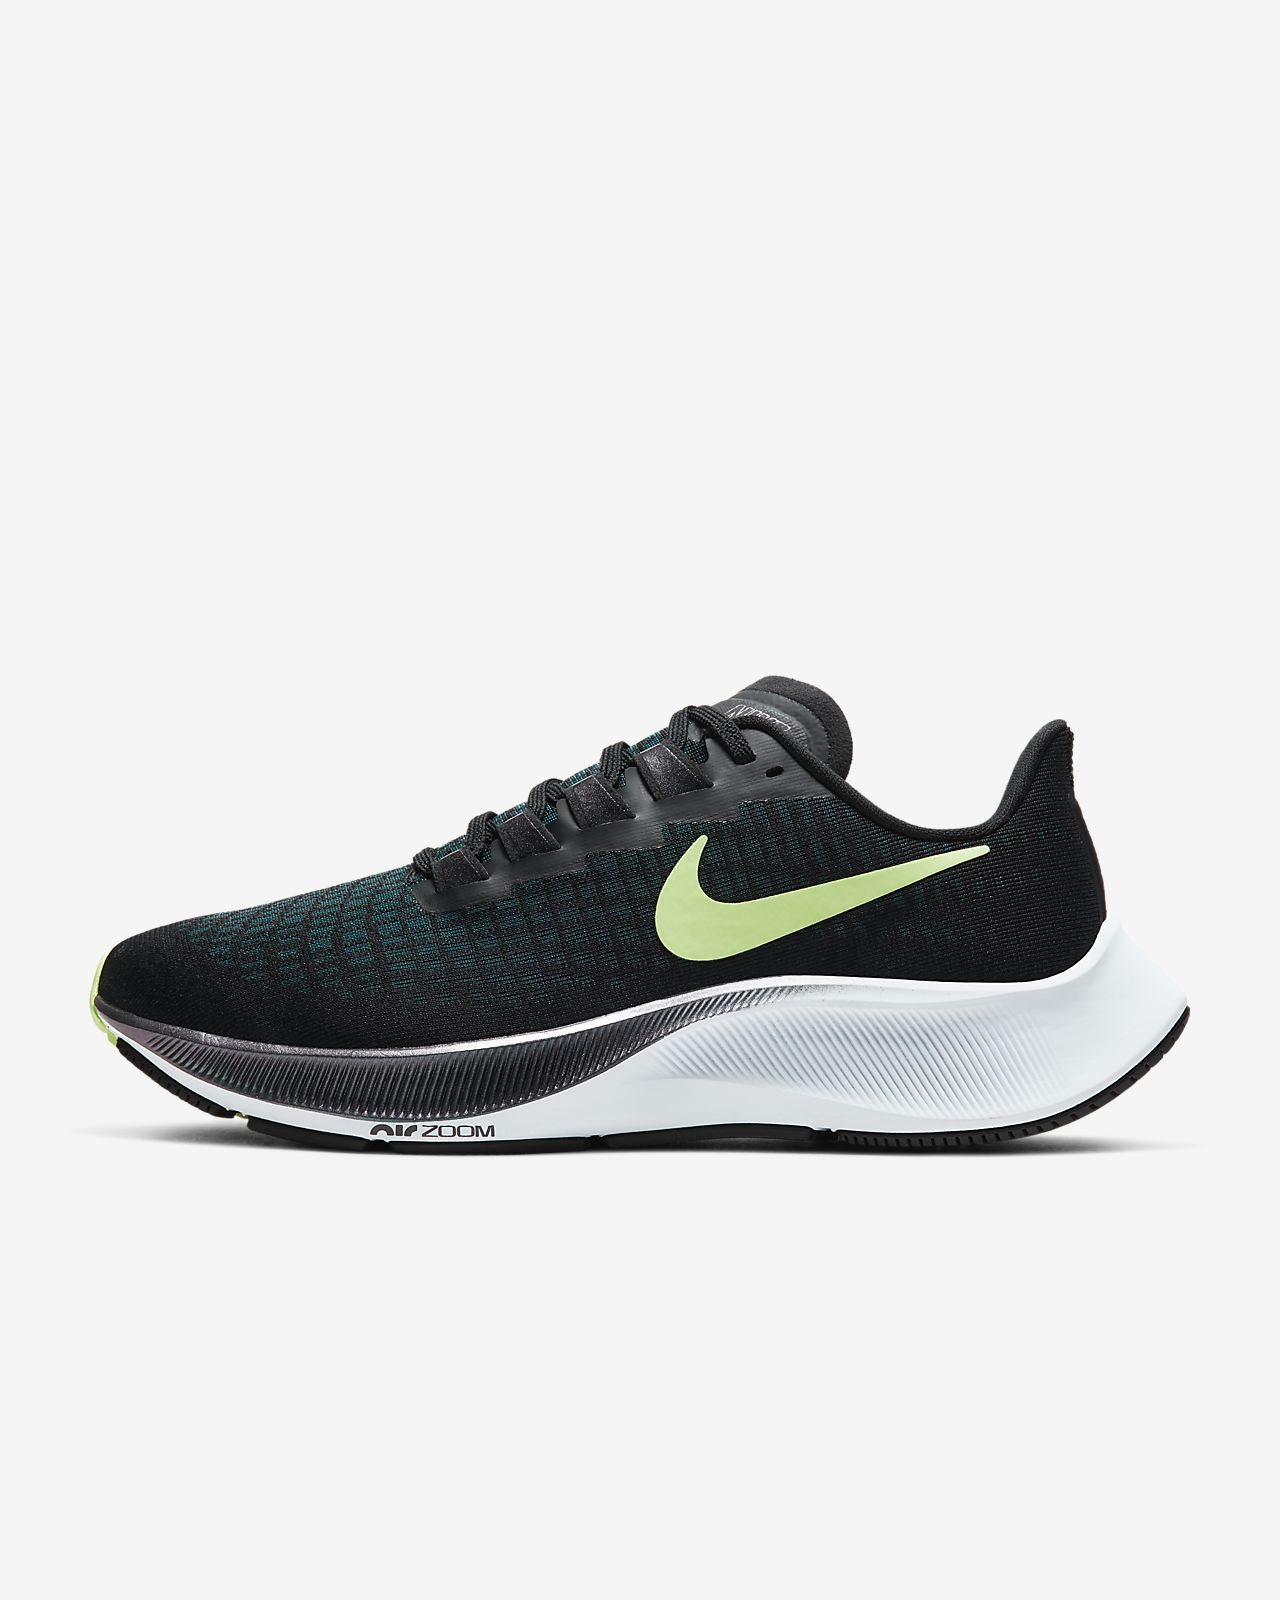 Sapatilhas de running Nike Air Zoom Pegasus 37 para mulher